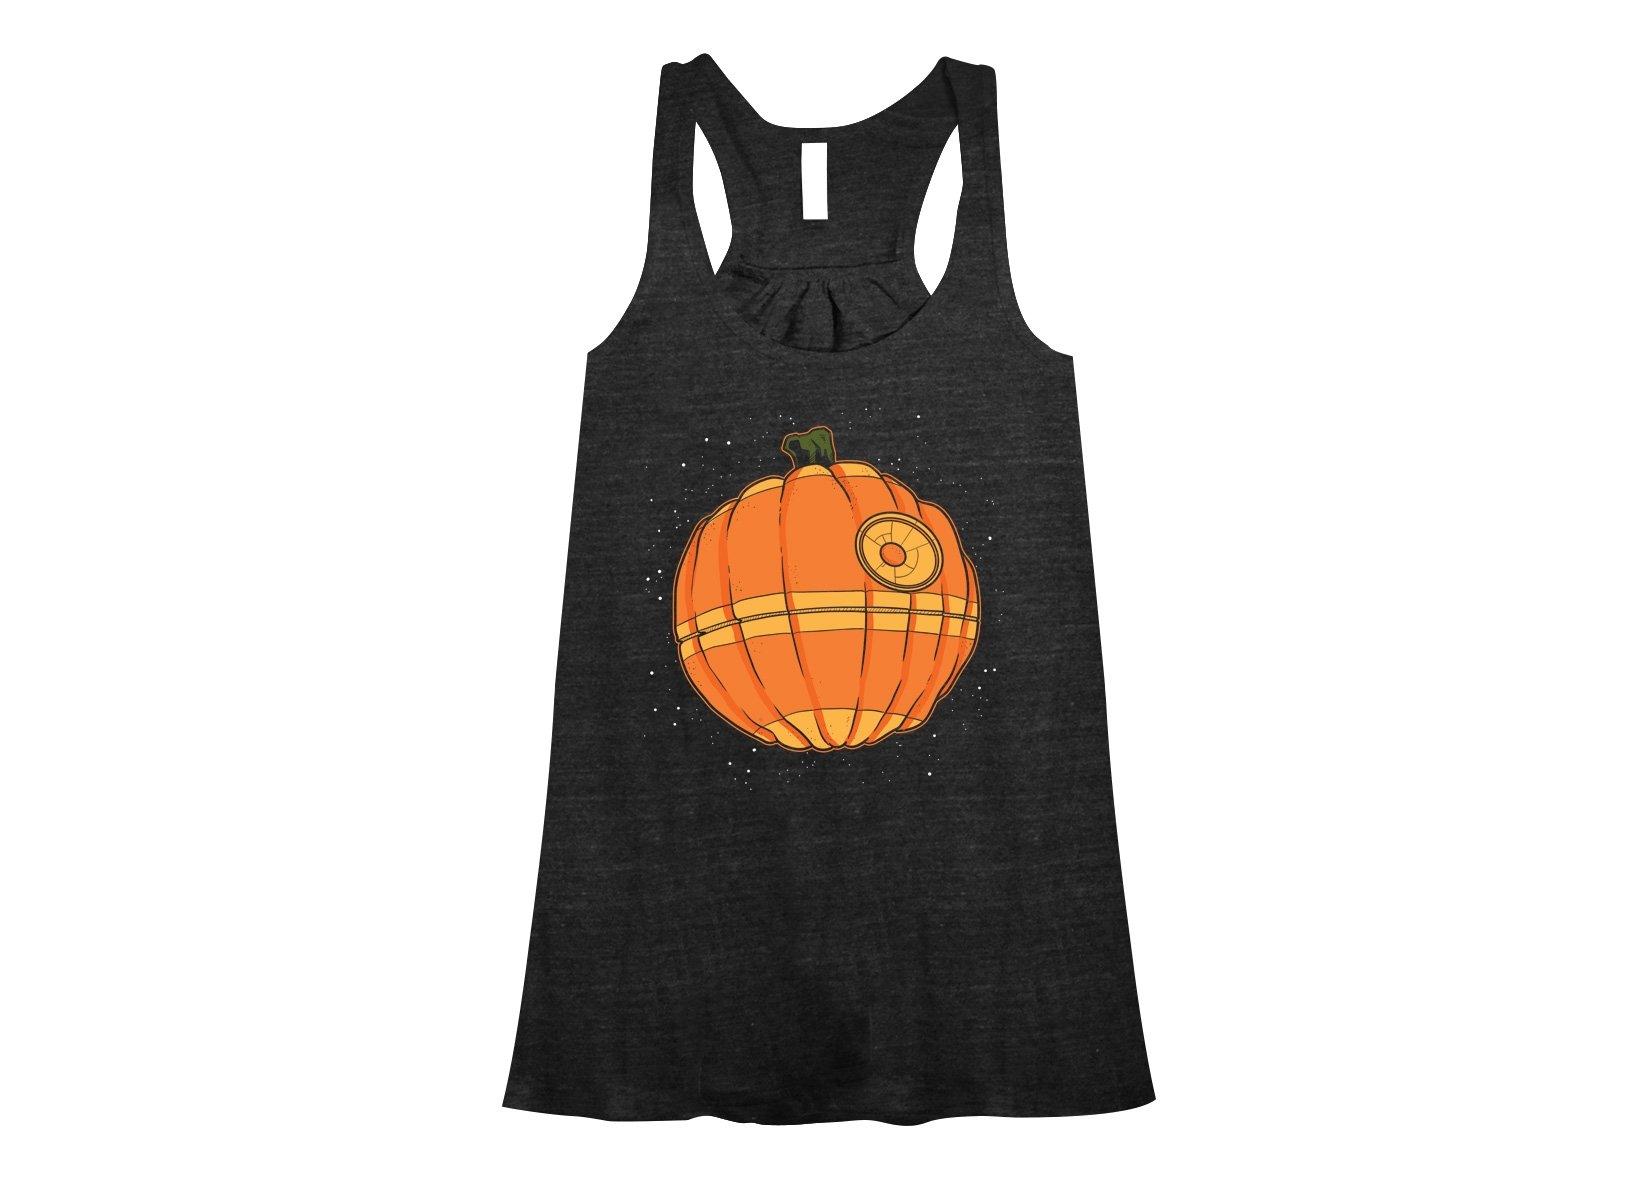 That's No Pumpkin on Womens Tanks T-Shirt